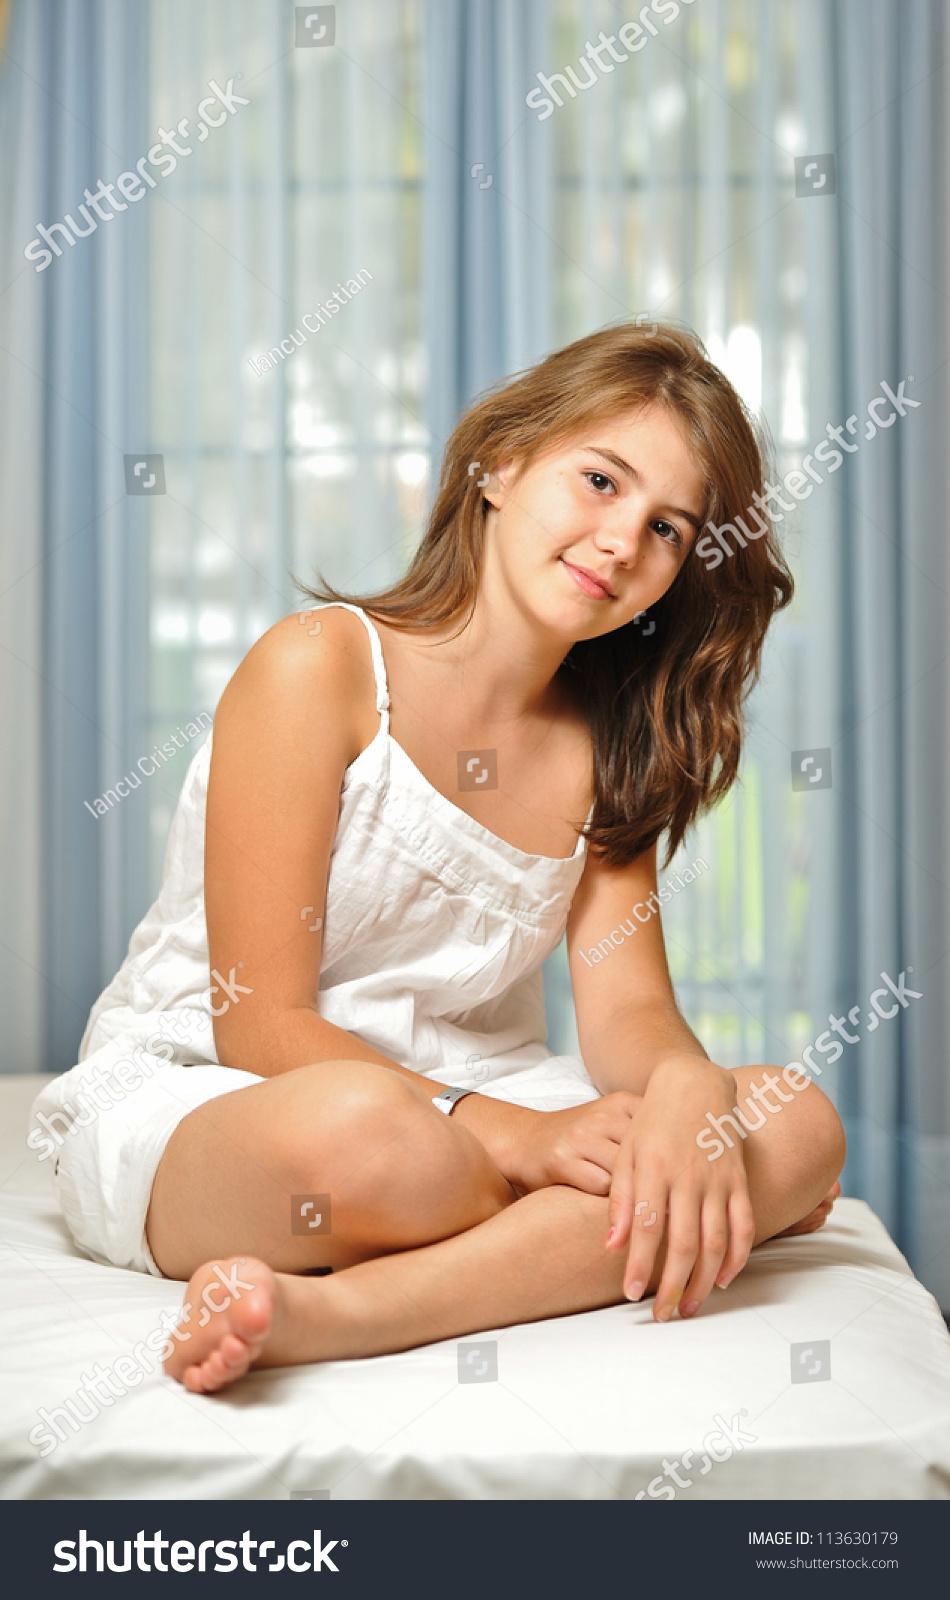 Portrait Smiling Beautiful Teen Girl Home Stock Photo 113630179 - Shutterstock-1326